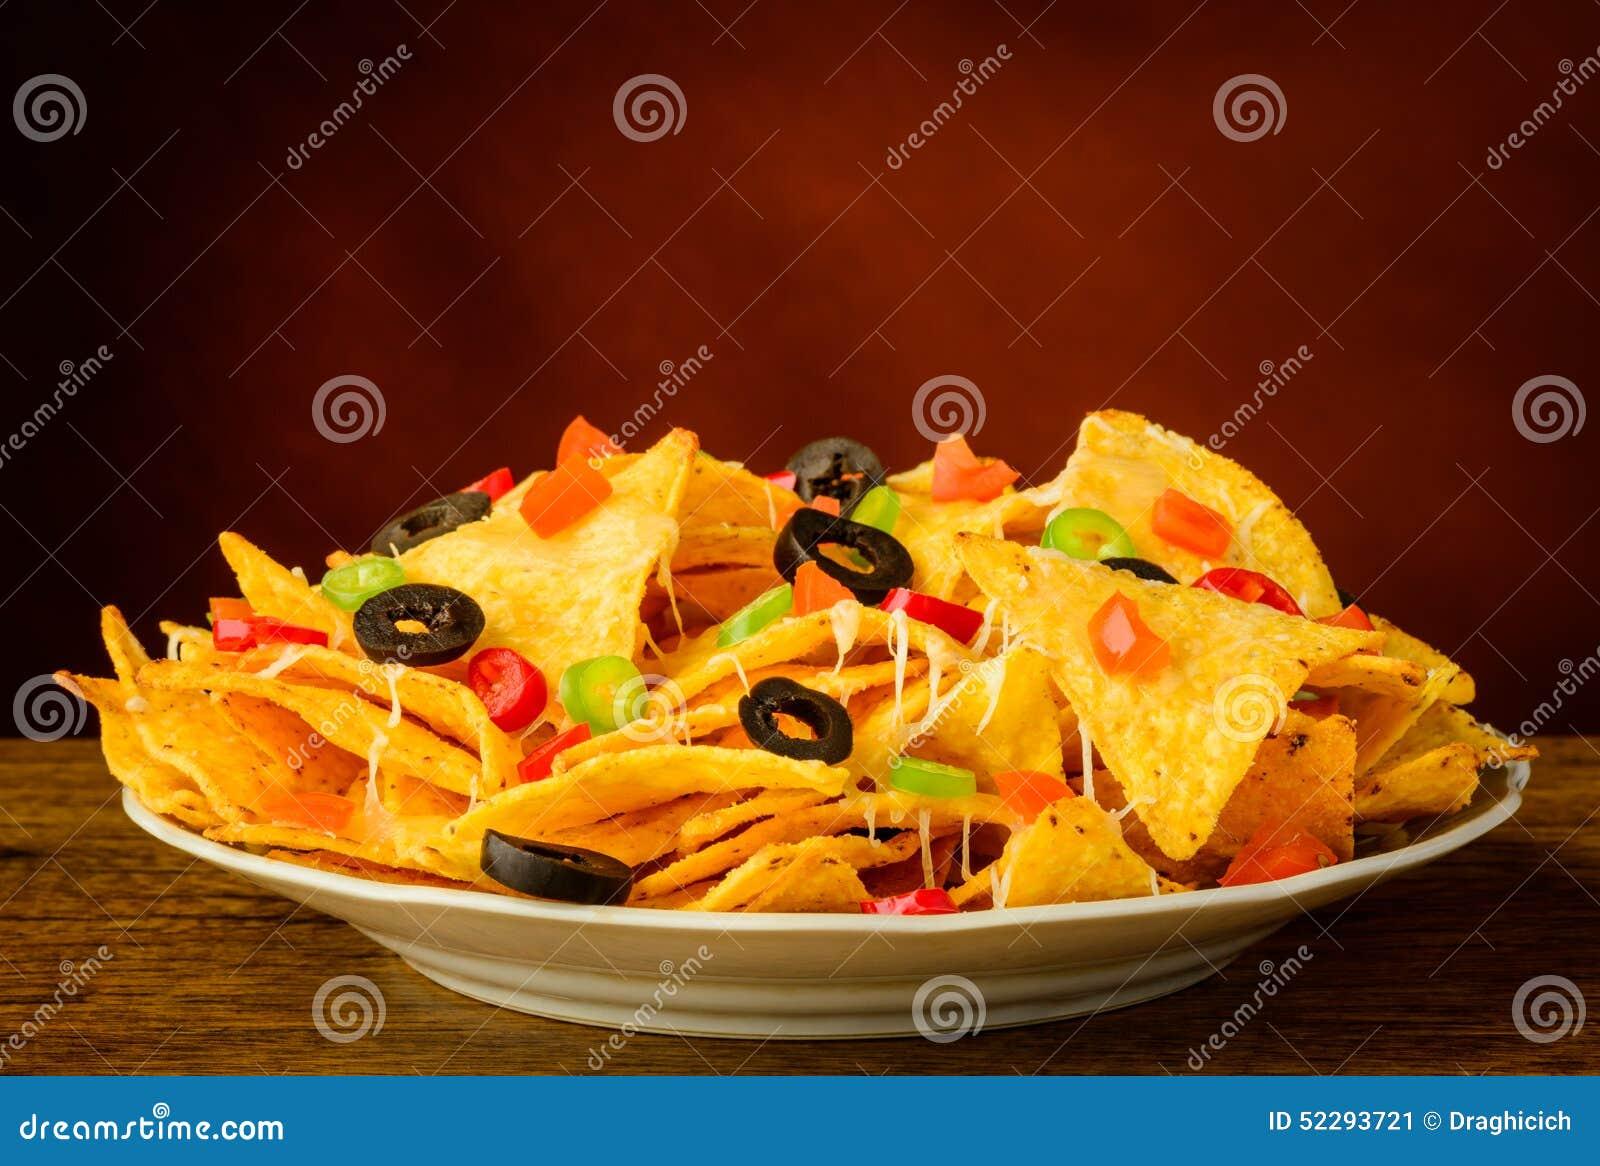 Chili Cheese Nachos Fast Food